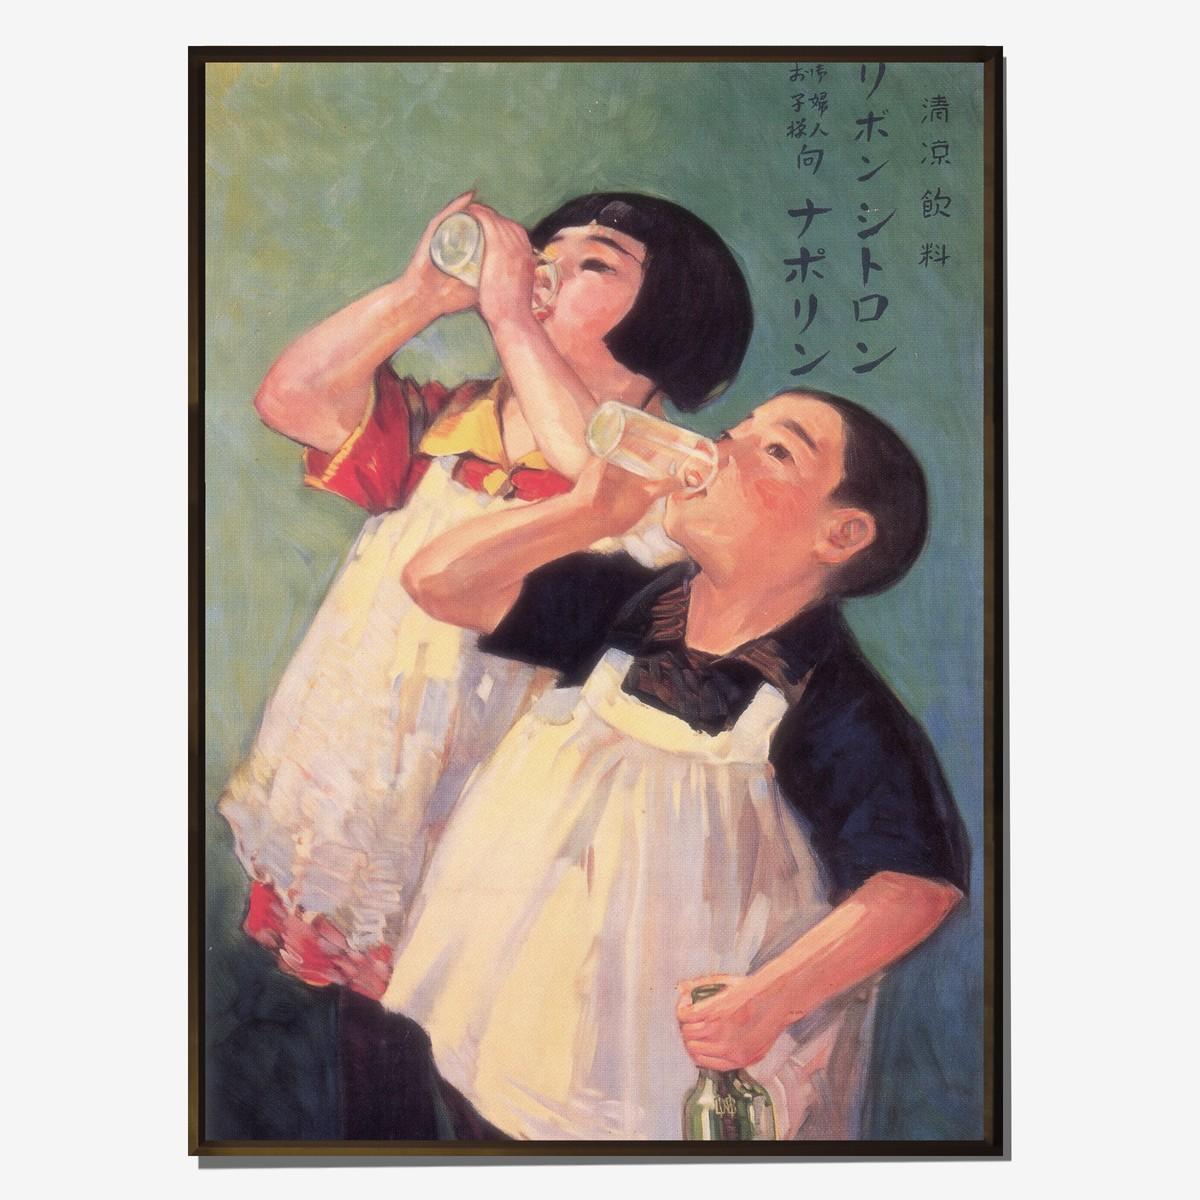 Photo of Ribbon Soda Vintage Advertising Poster